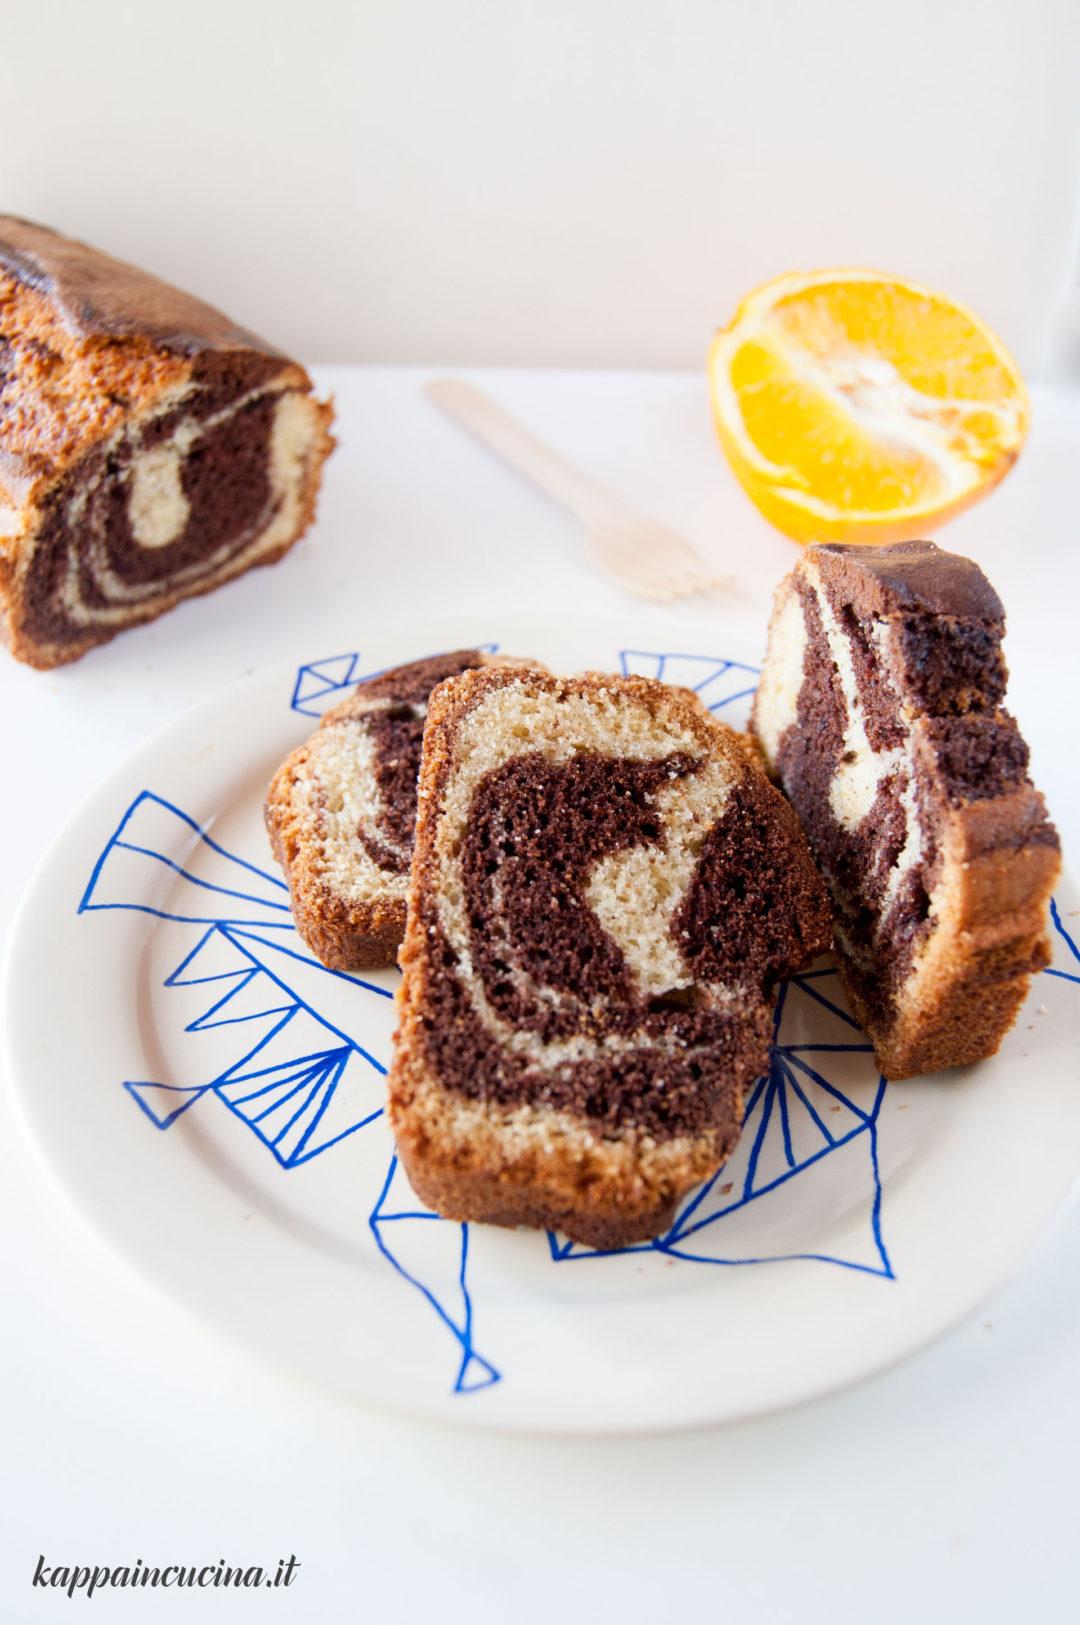 plumcake marmorizzato arancia cioccolato